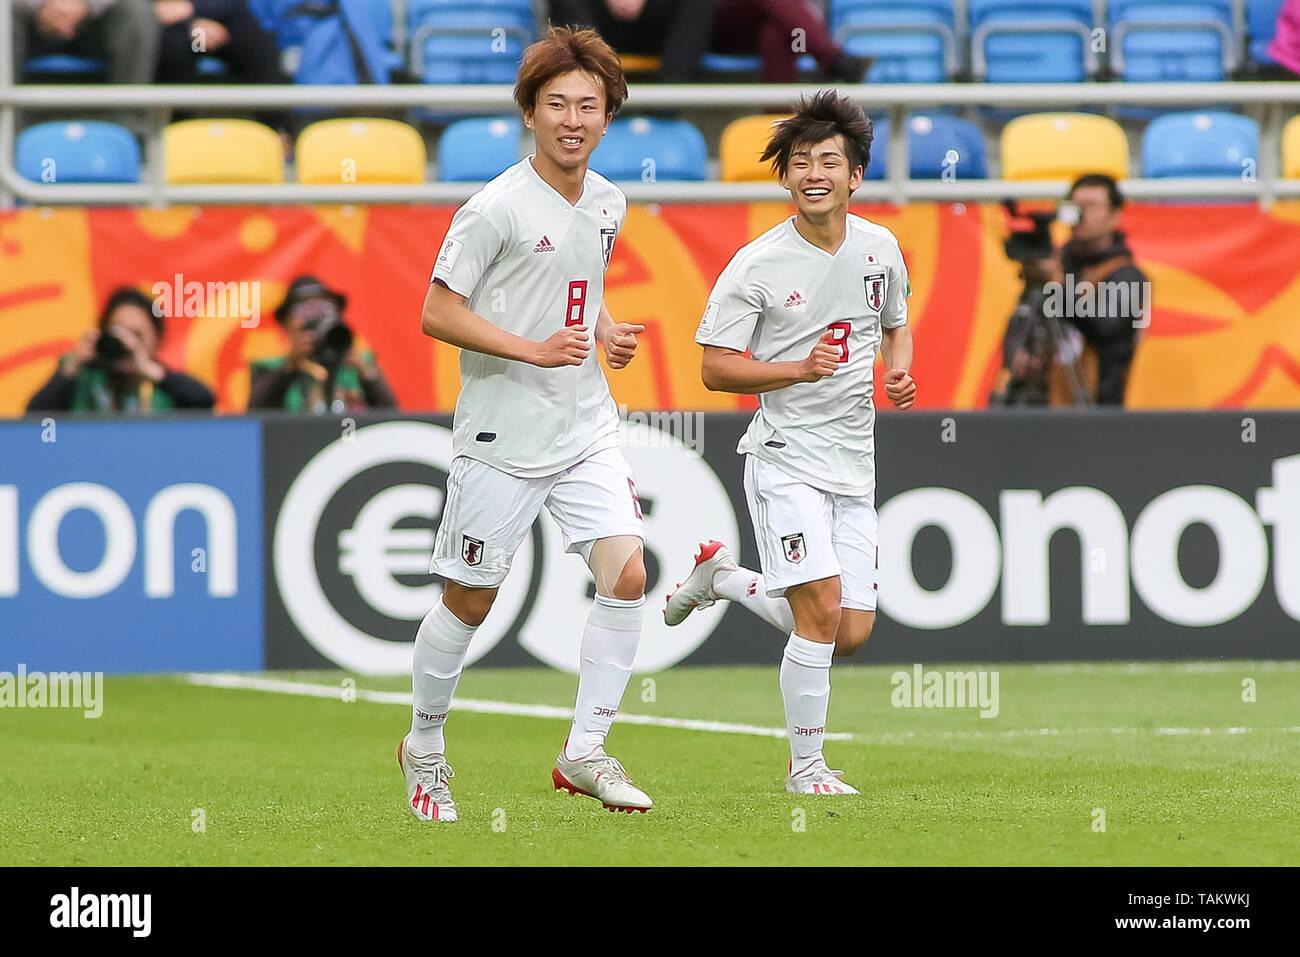 Gdynia Stadium, Gdynia, Poland - 26th May, 2019: Kanya Fujimoto(L) and Yuki Kobayashi (R) from Japan are seen celebrating after scoring a goal during FIFA U-20 World Cup match between Mexico and Japan (GROUP B) in Gdynia. (Final score; Mexico 0:3 Japan) - Stock Image